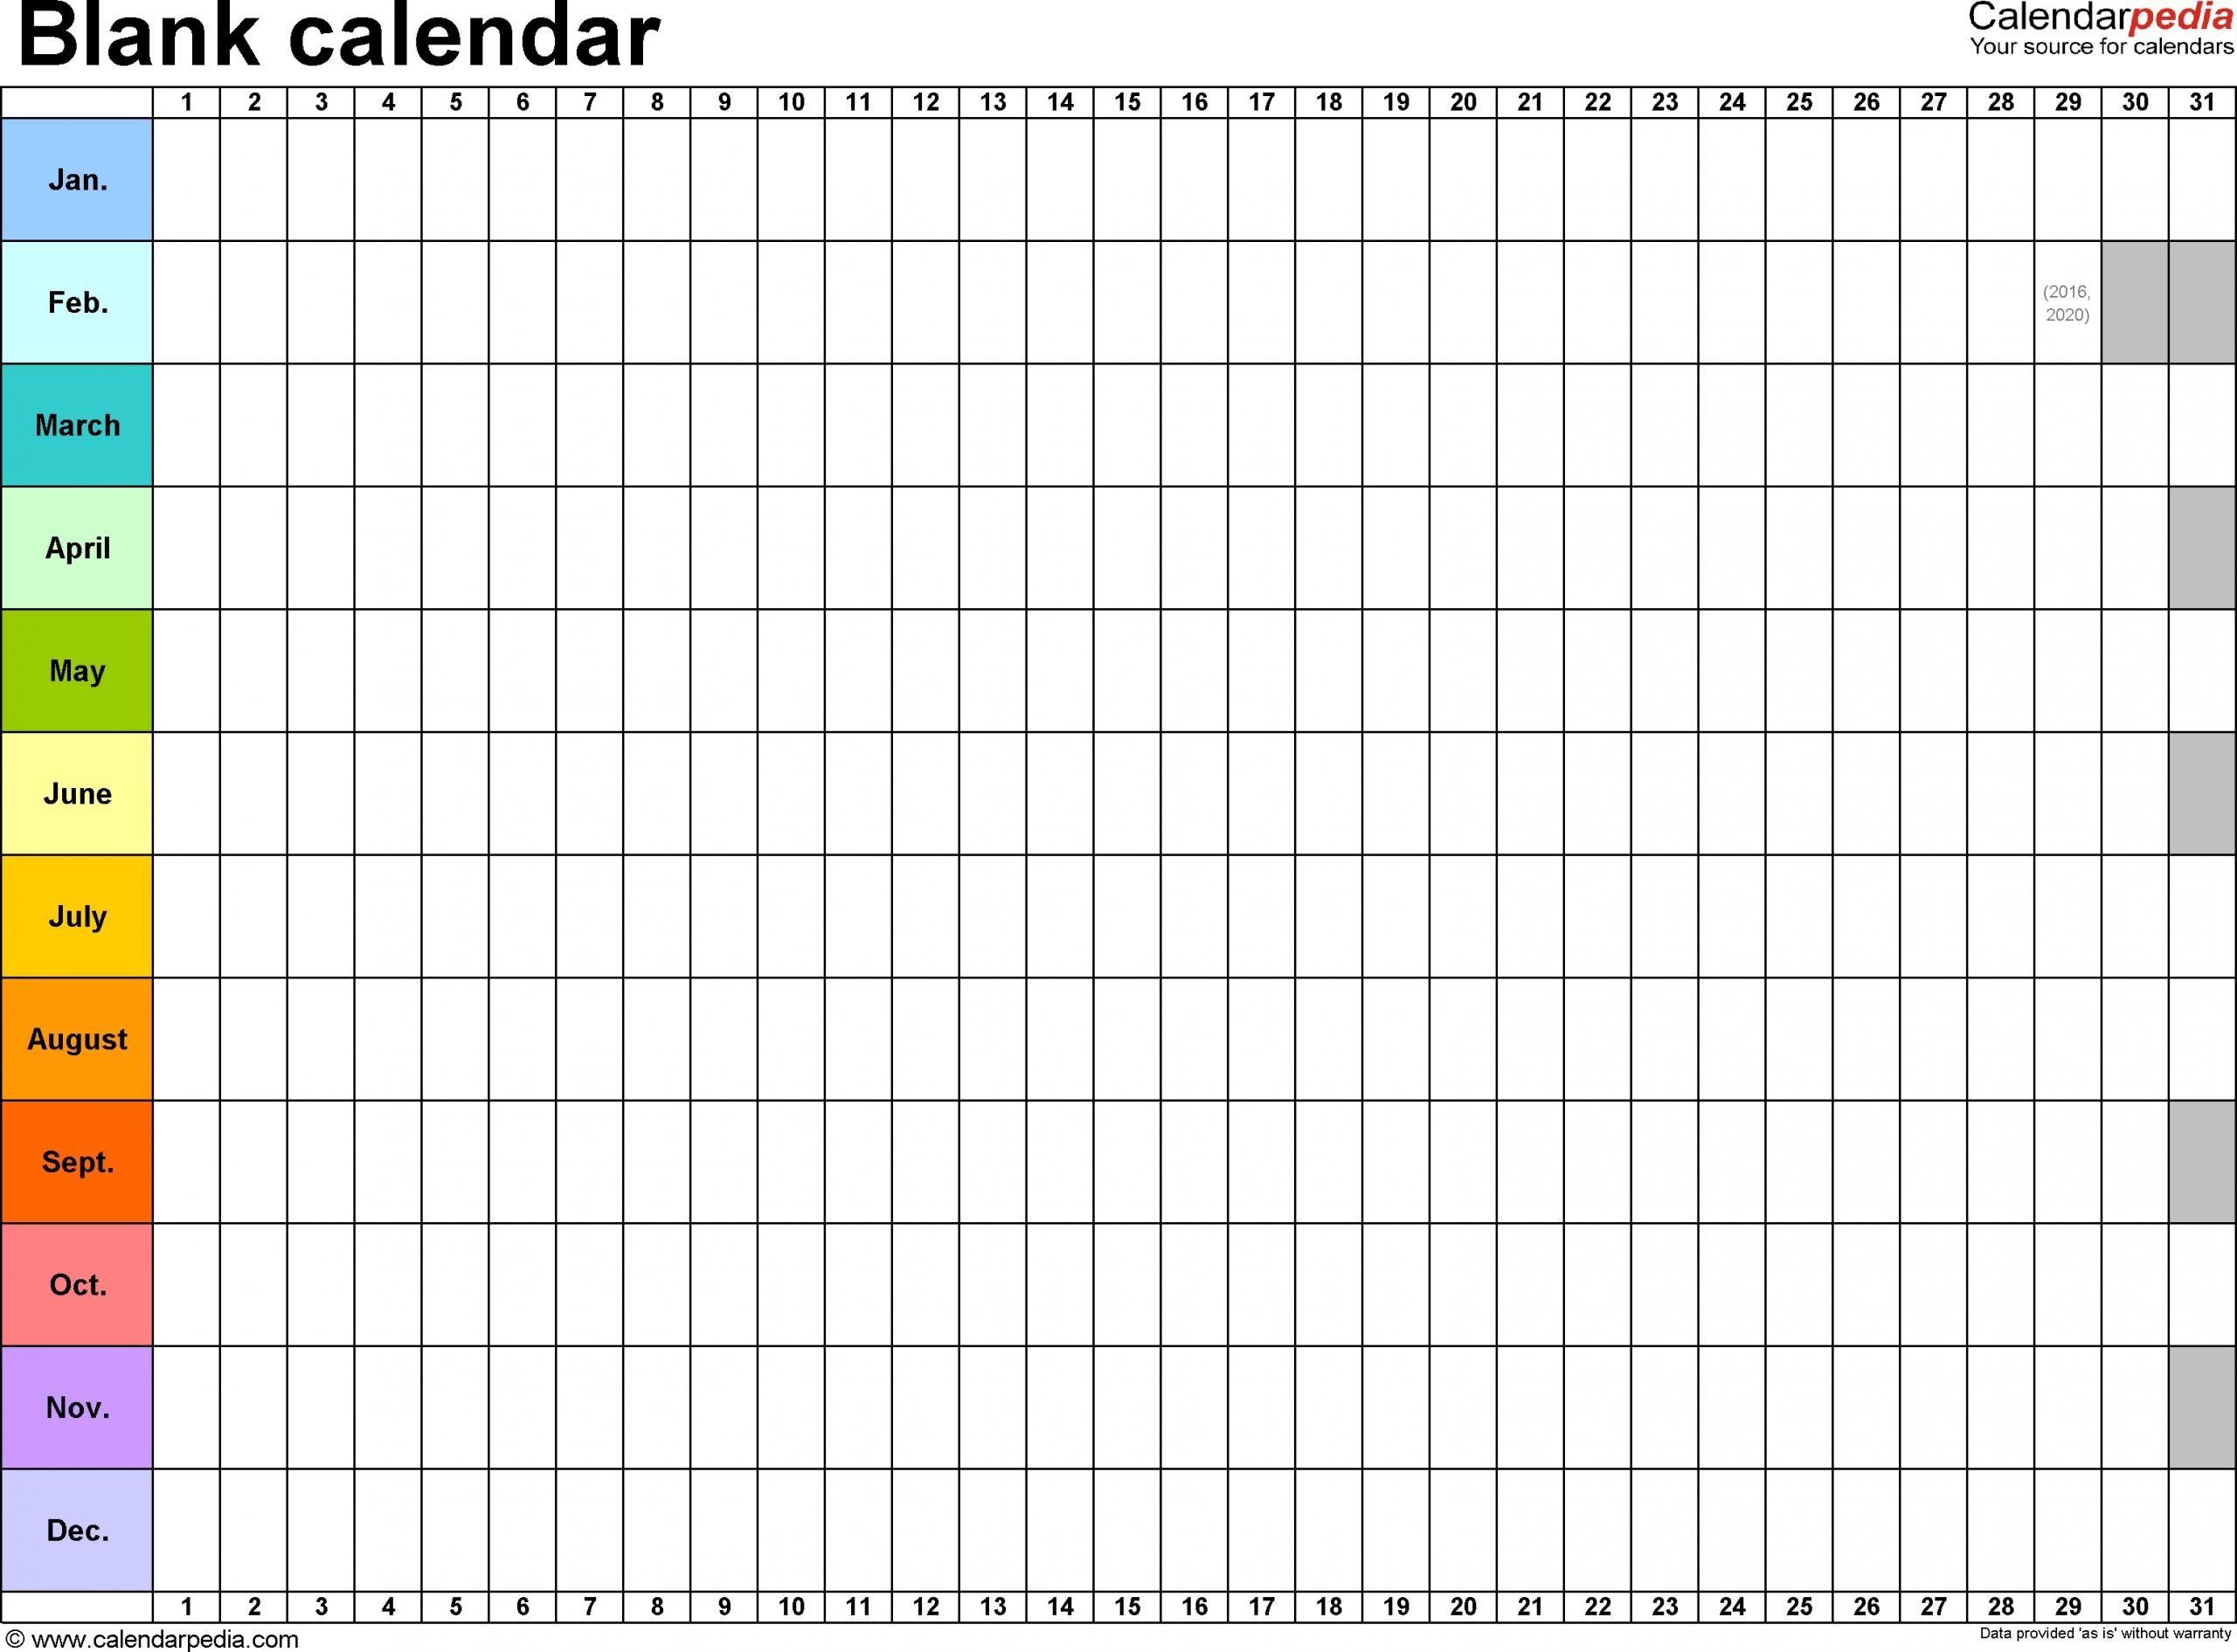 Blank Calendar Print Out | Blank Calendar Template, Monthly Calendar Printable, Printable Blank throughout Sample One Page Multi Year Calendars Image